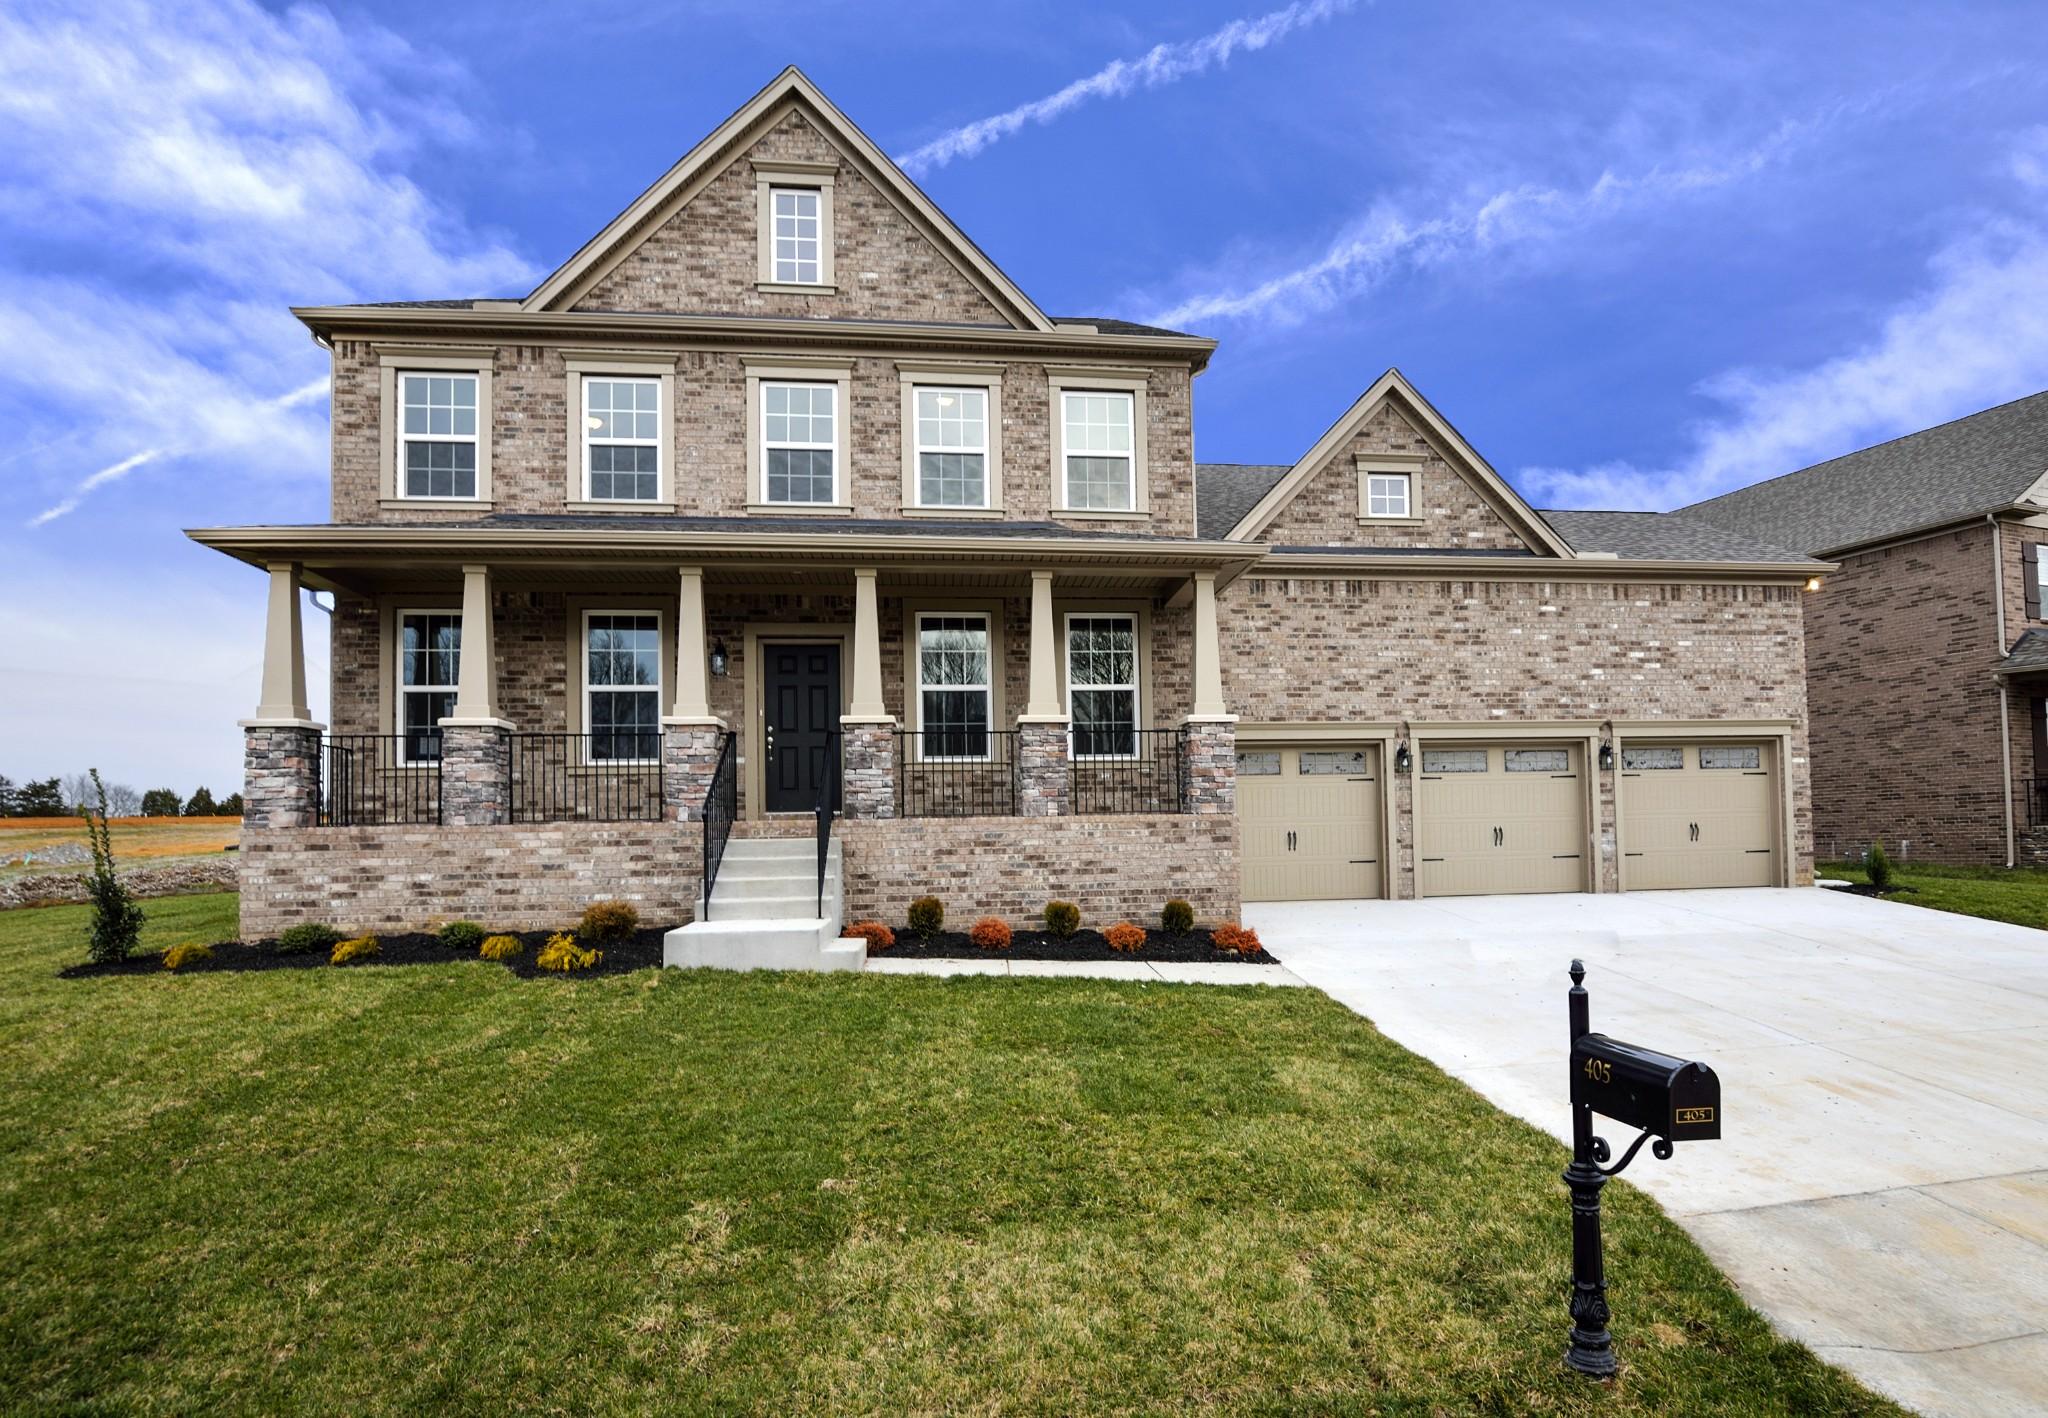 405 Everlee Lane Lot 130, Mount Juliet, TN 37122 - Mount Juliet, TN real estate listing